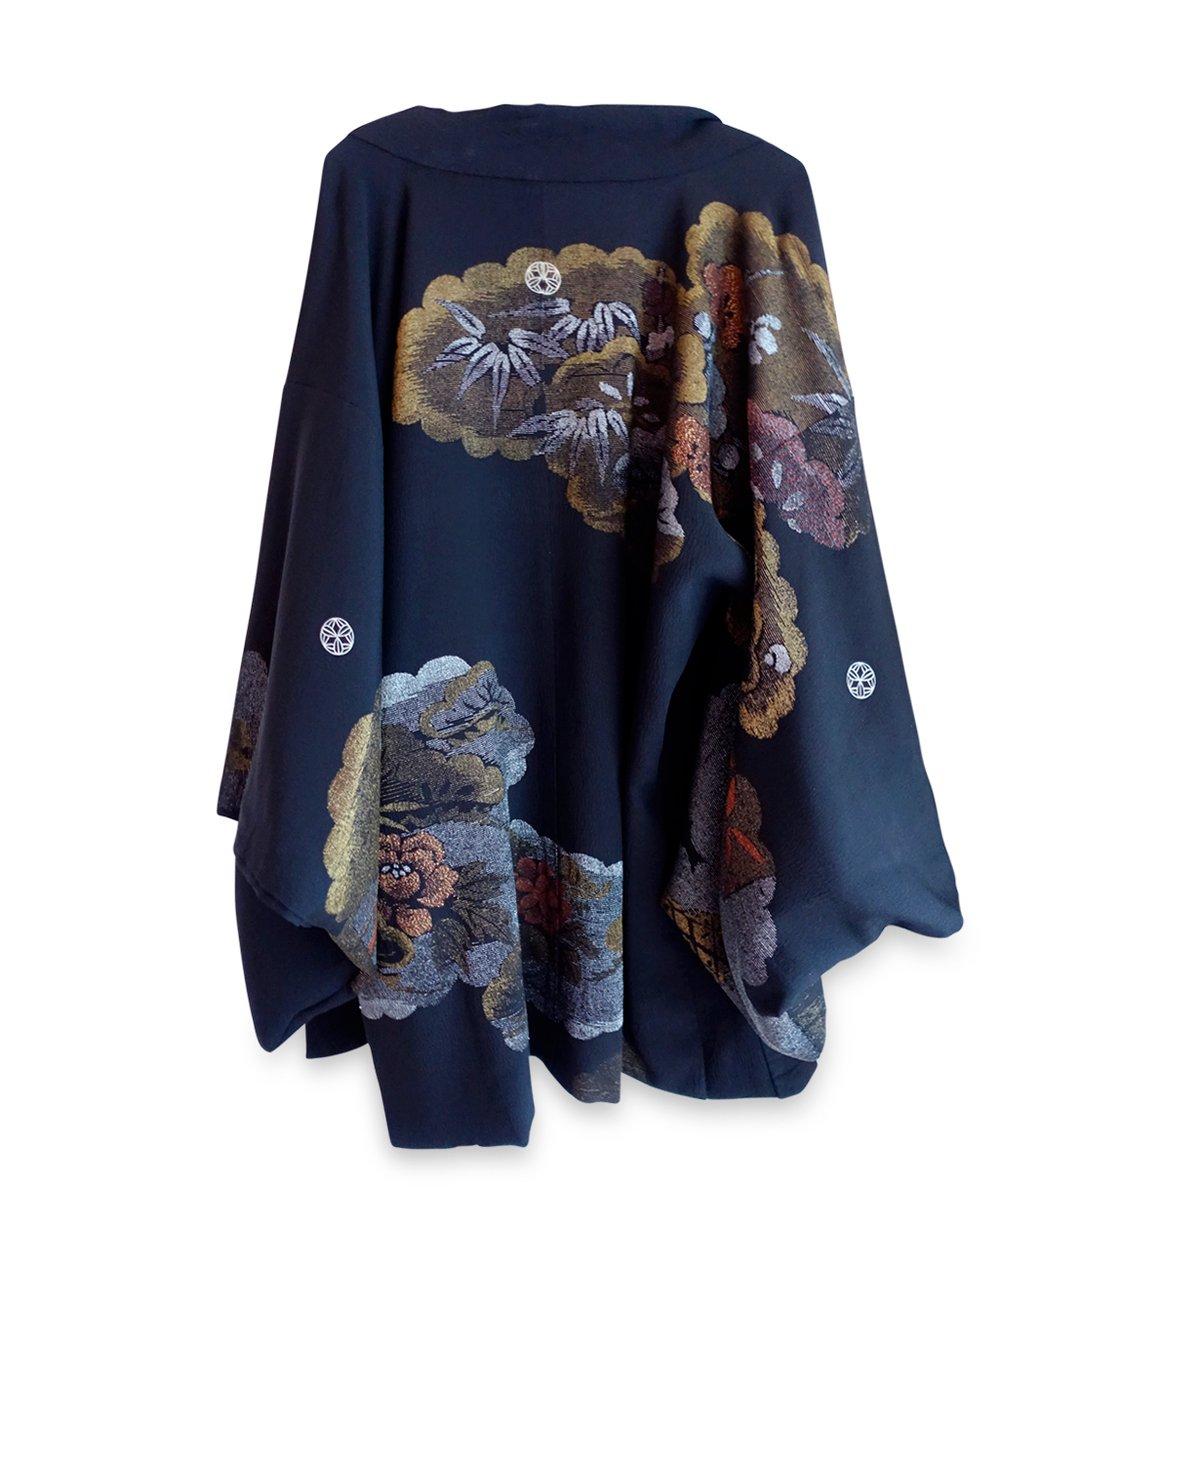 Image of Sort kort kimono med metalisk blomsterflor